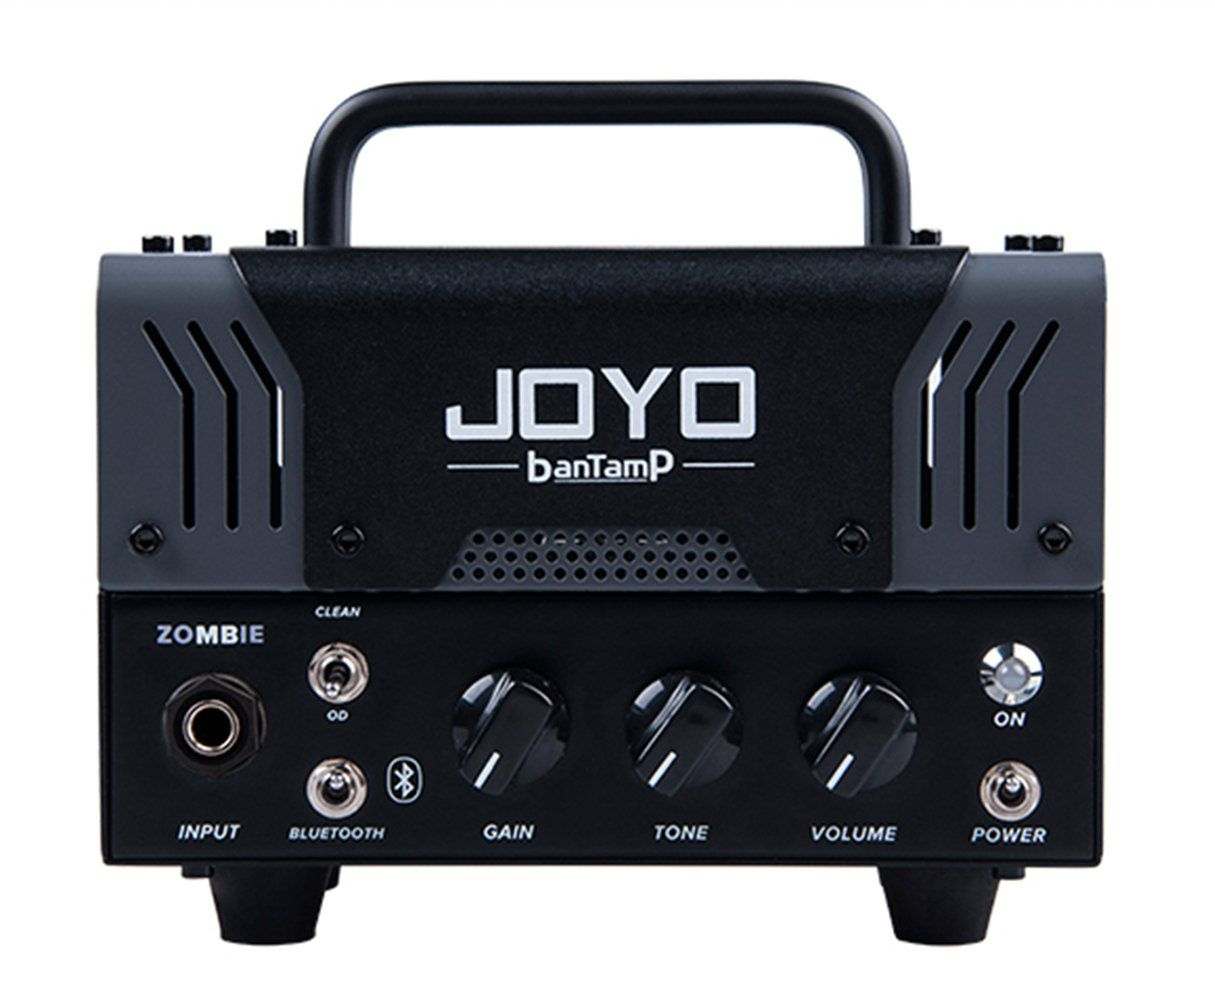 Cabeçote de Guitarra Bantamp Joyo Zombie